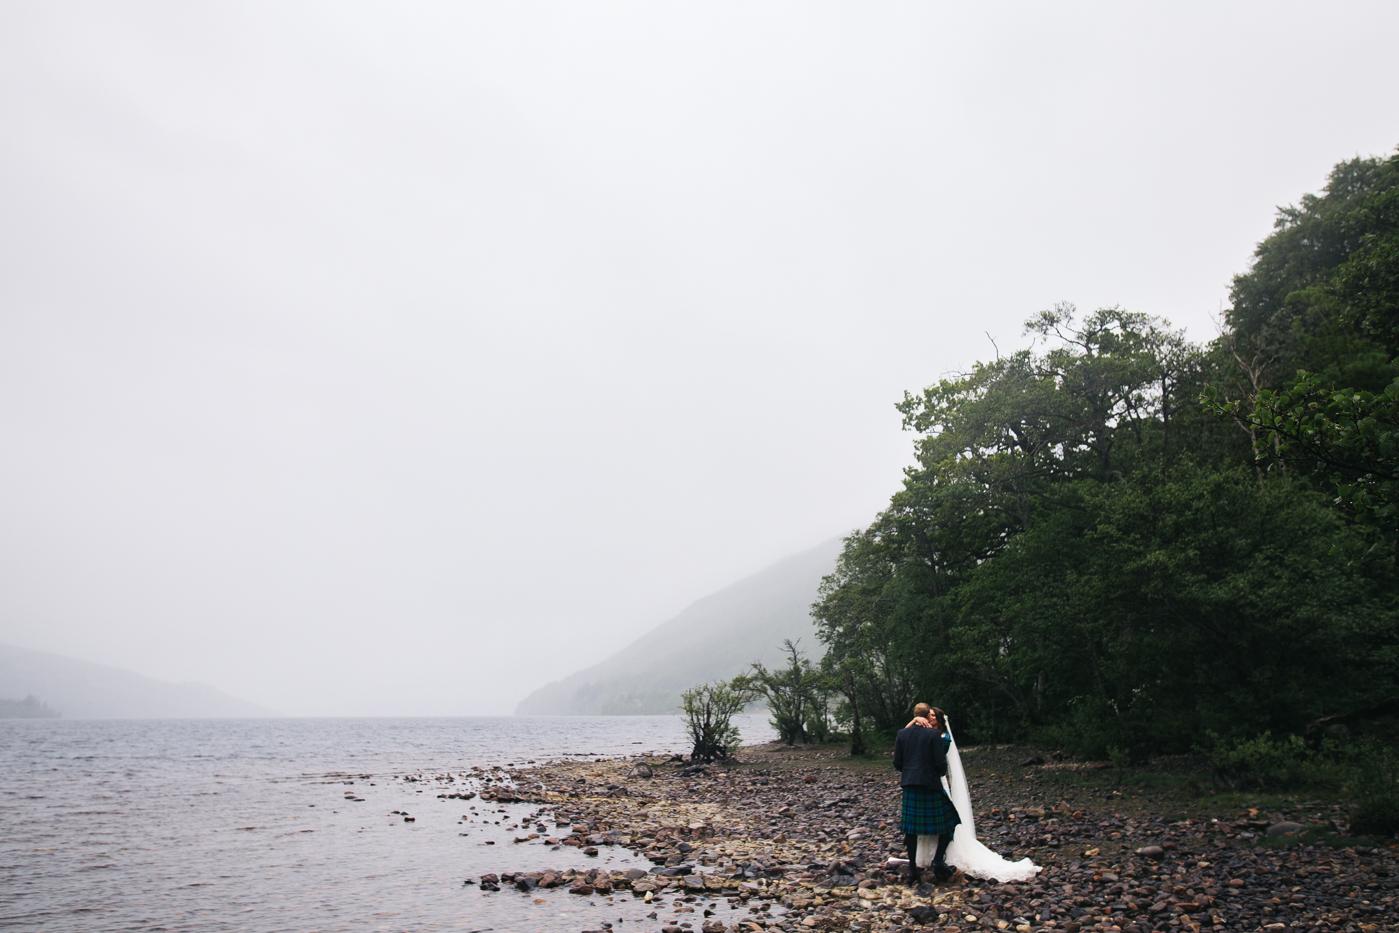 scottish-wedding-trossachs-loch-tay-highlannds-relaxed-photography-photographer-0030.jpg